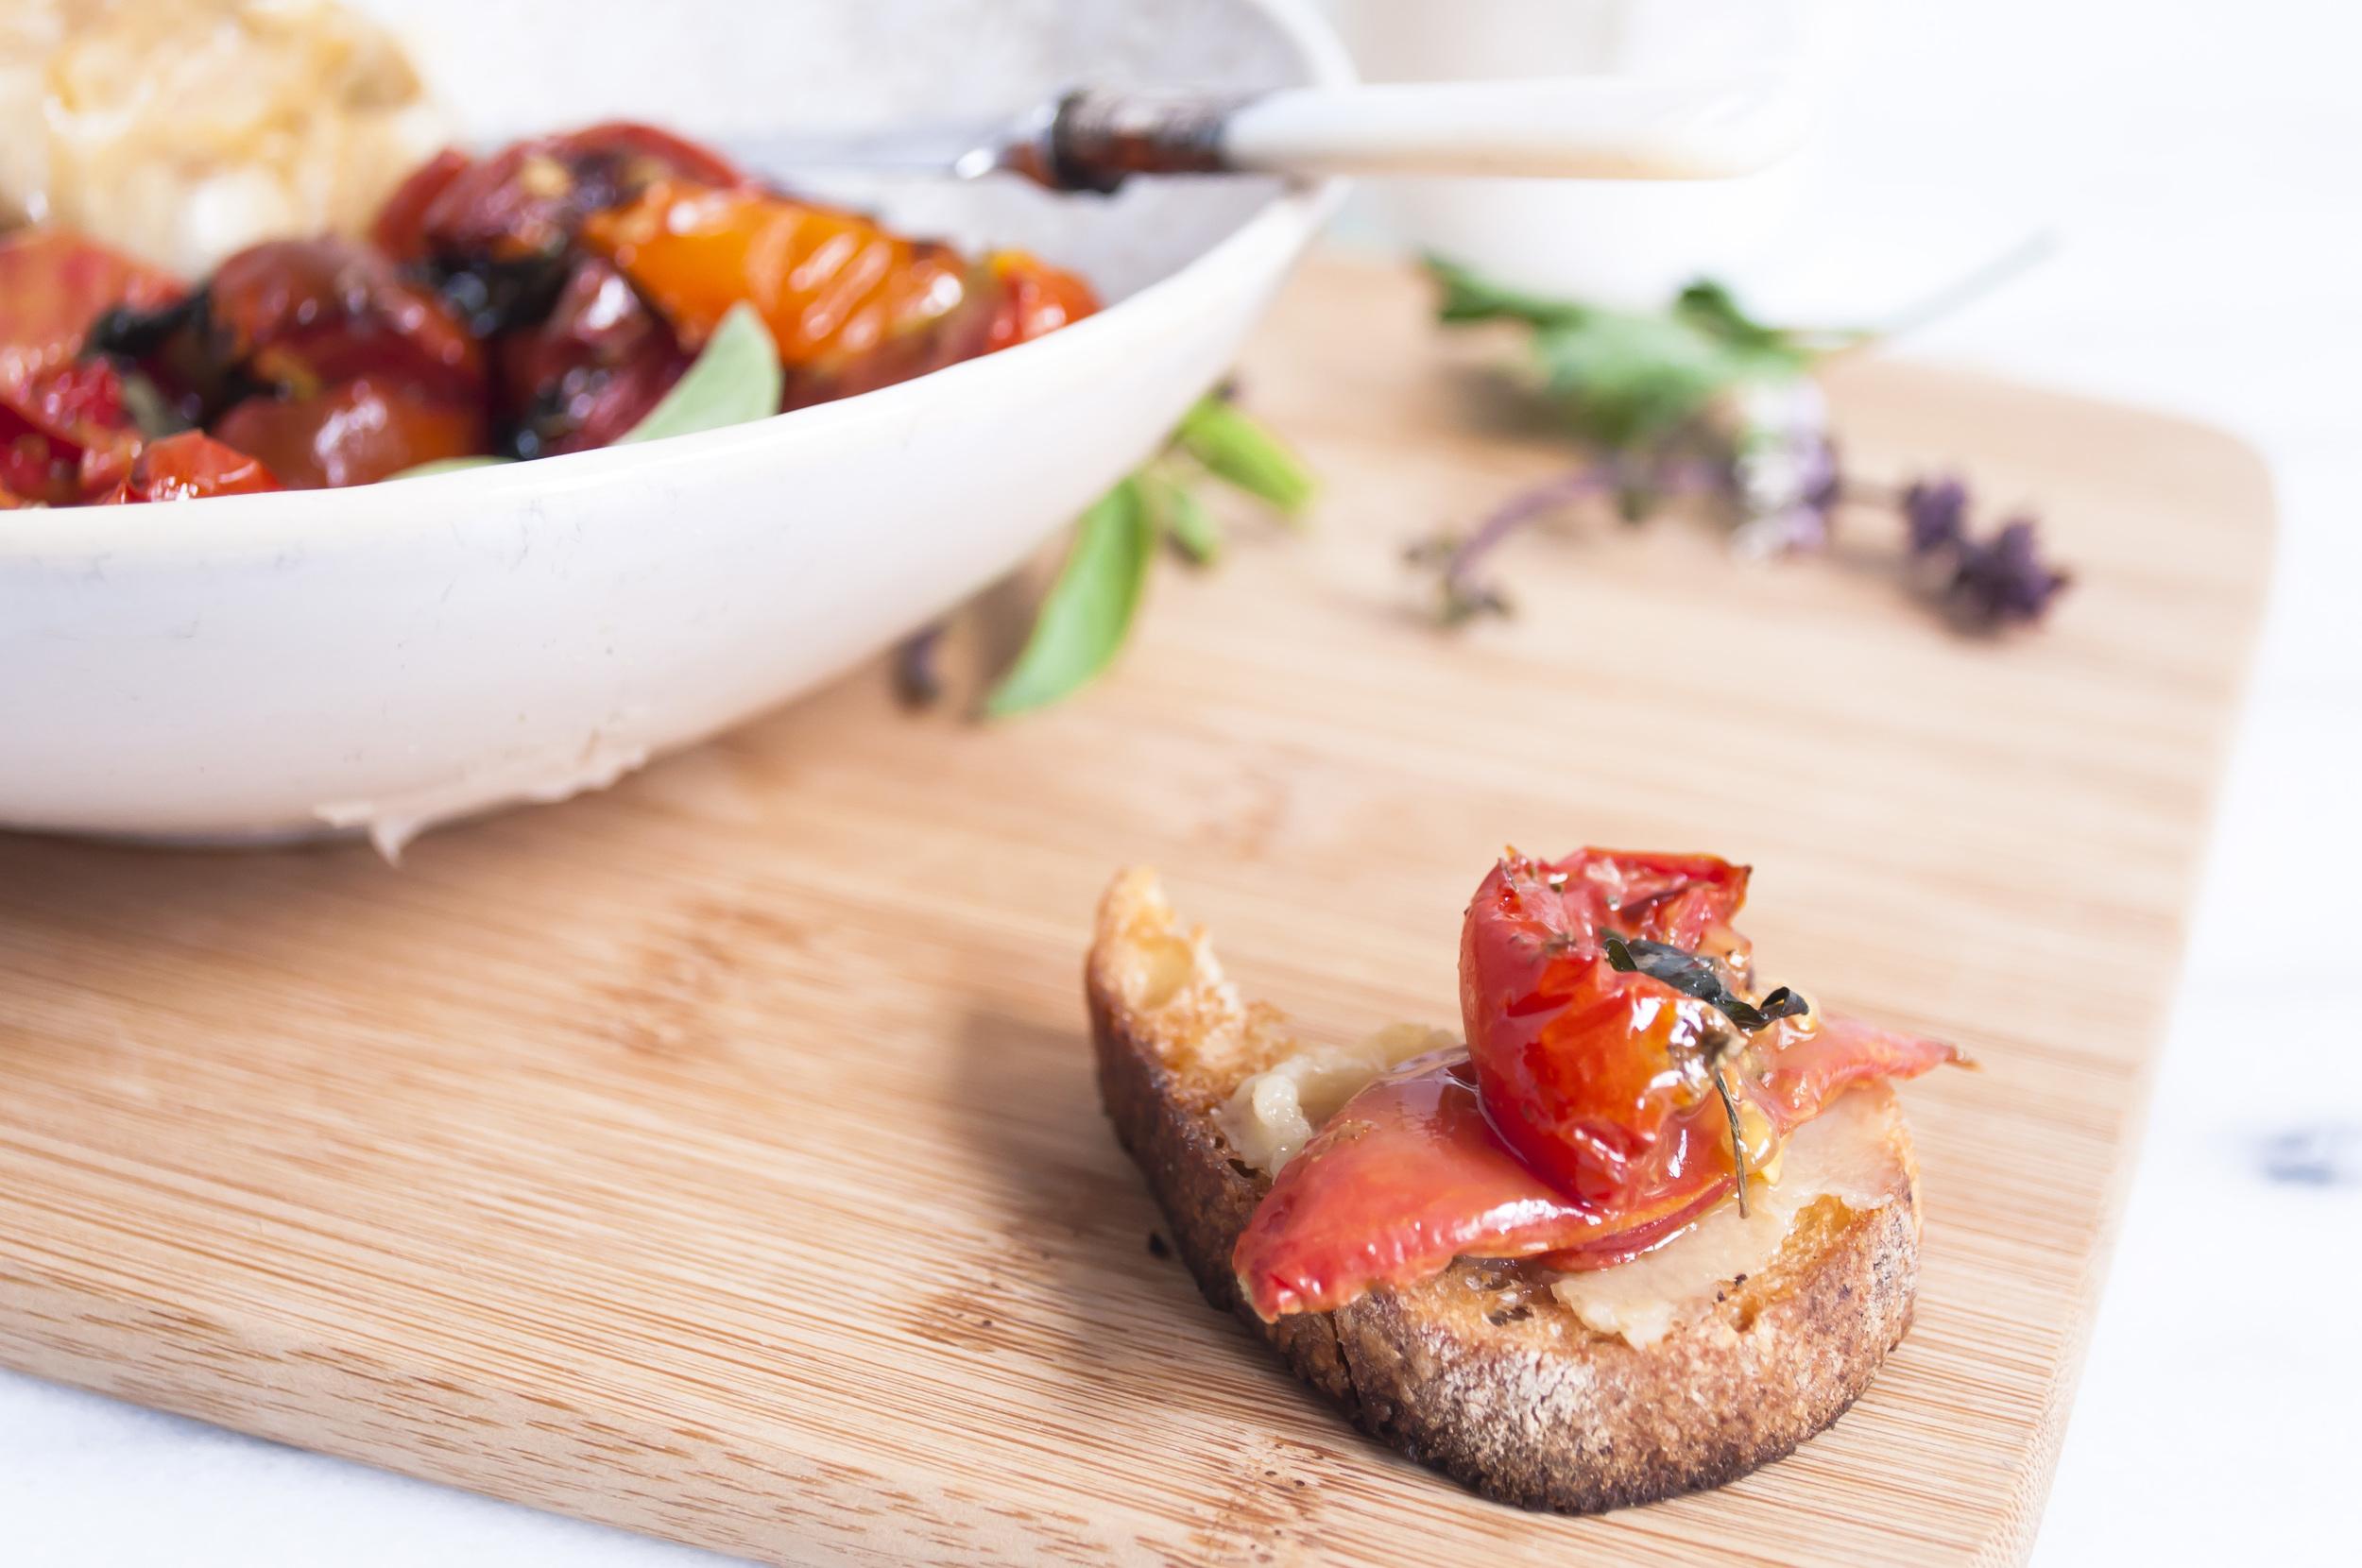 Roasted Garlic and Heirloom Cherry Tomatoes on Toast